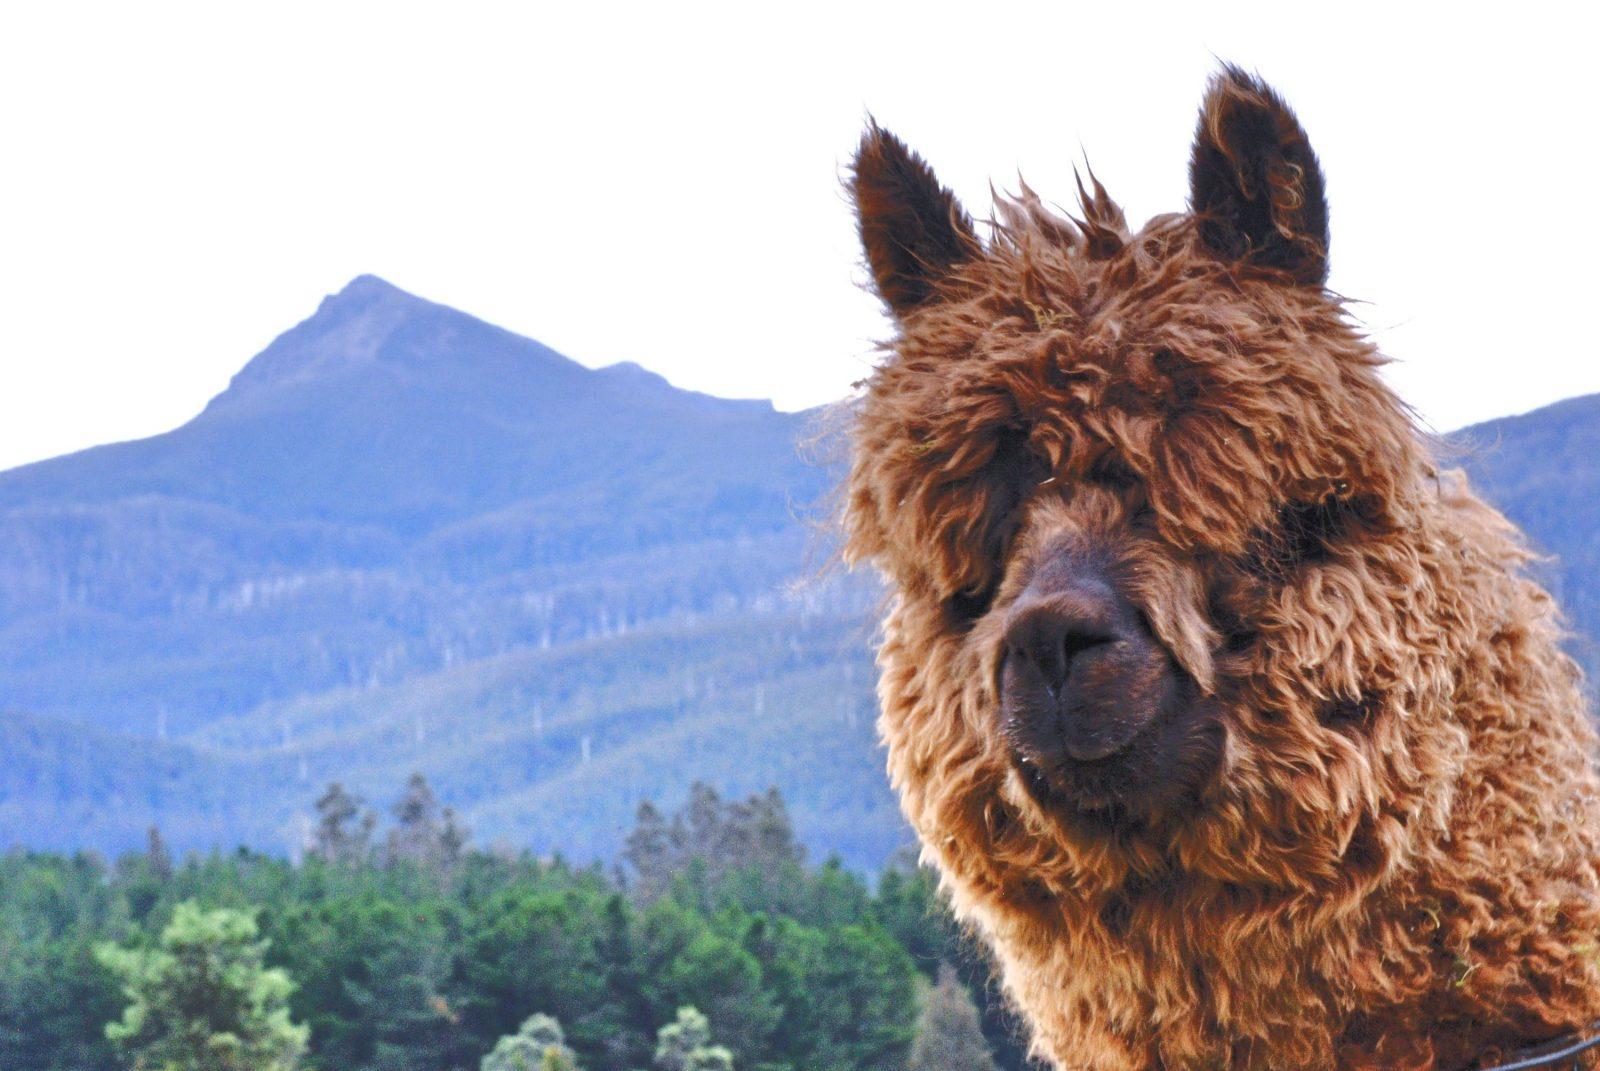 Maydena Mountain Cabins alpacas and mountain views